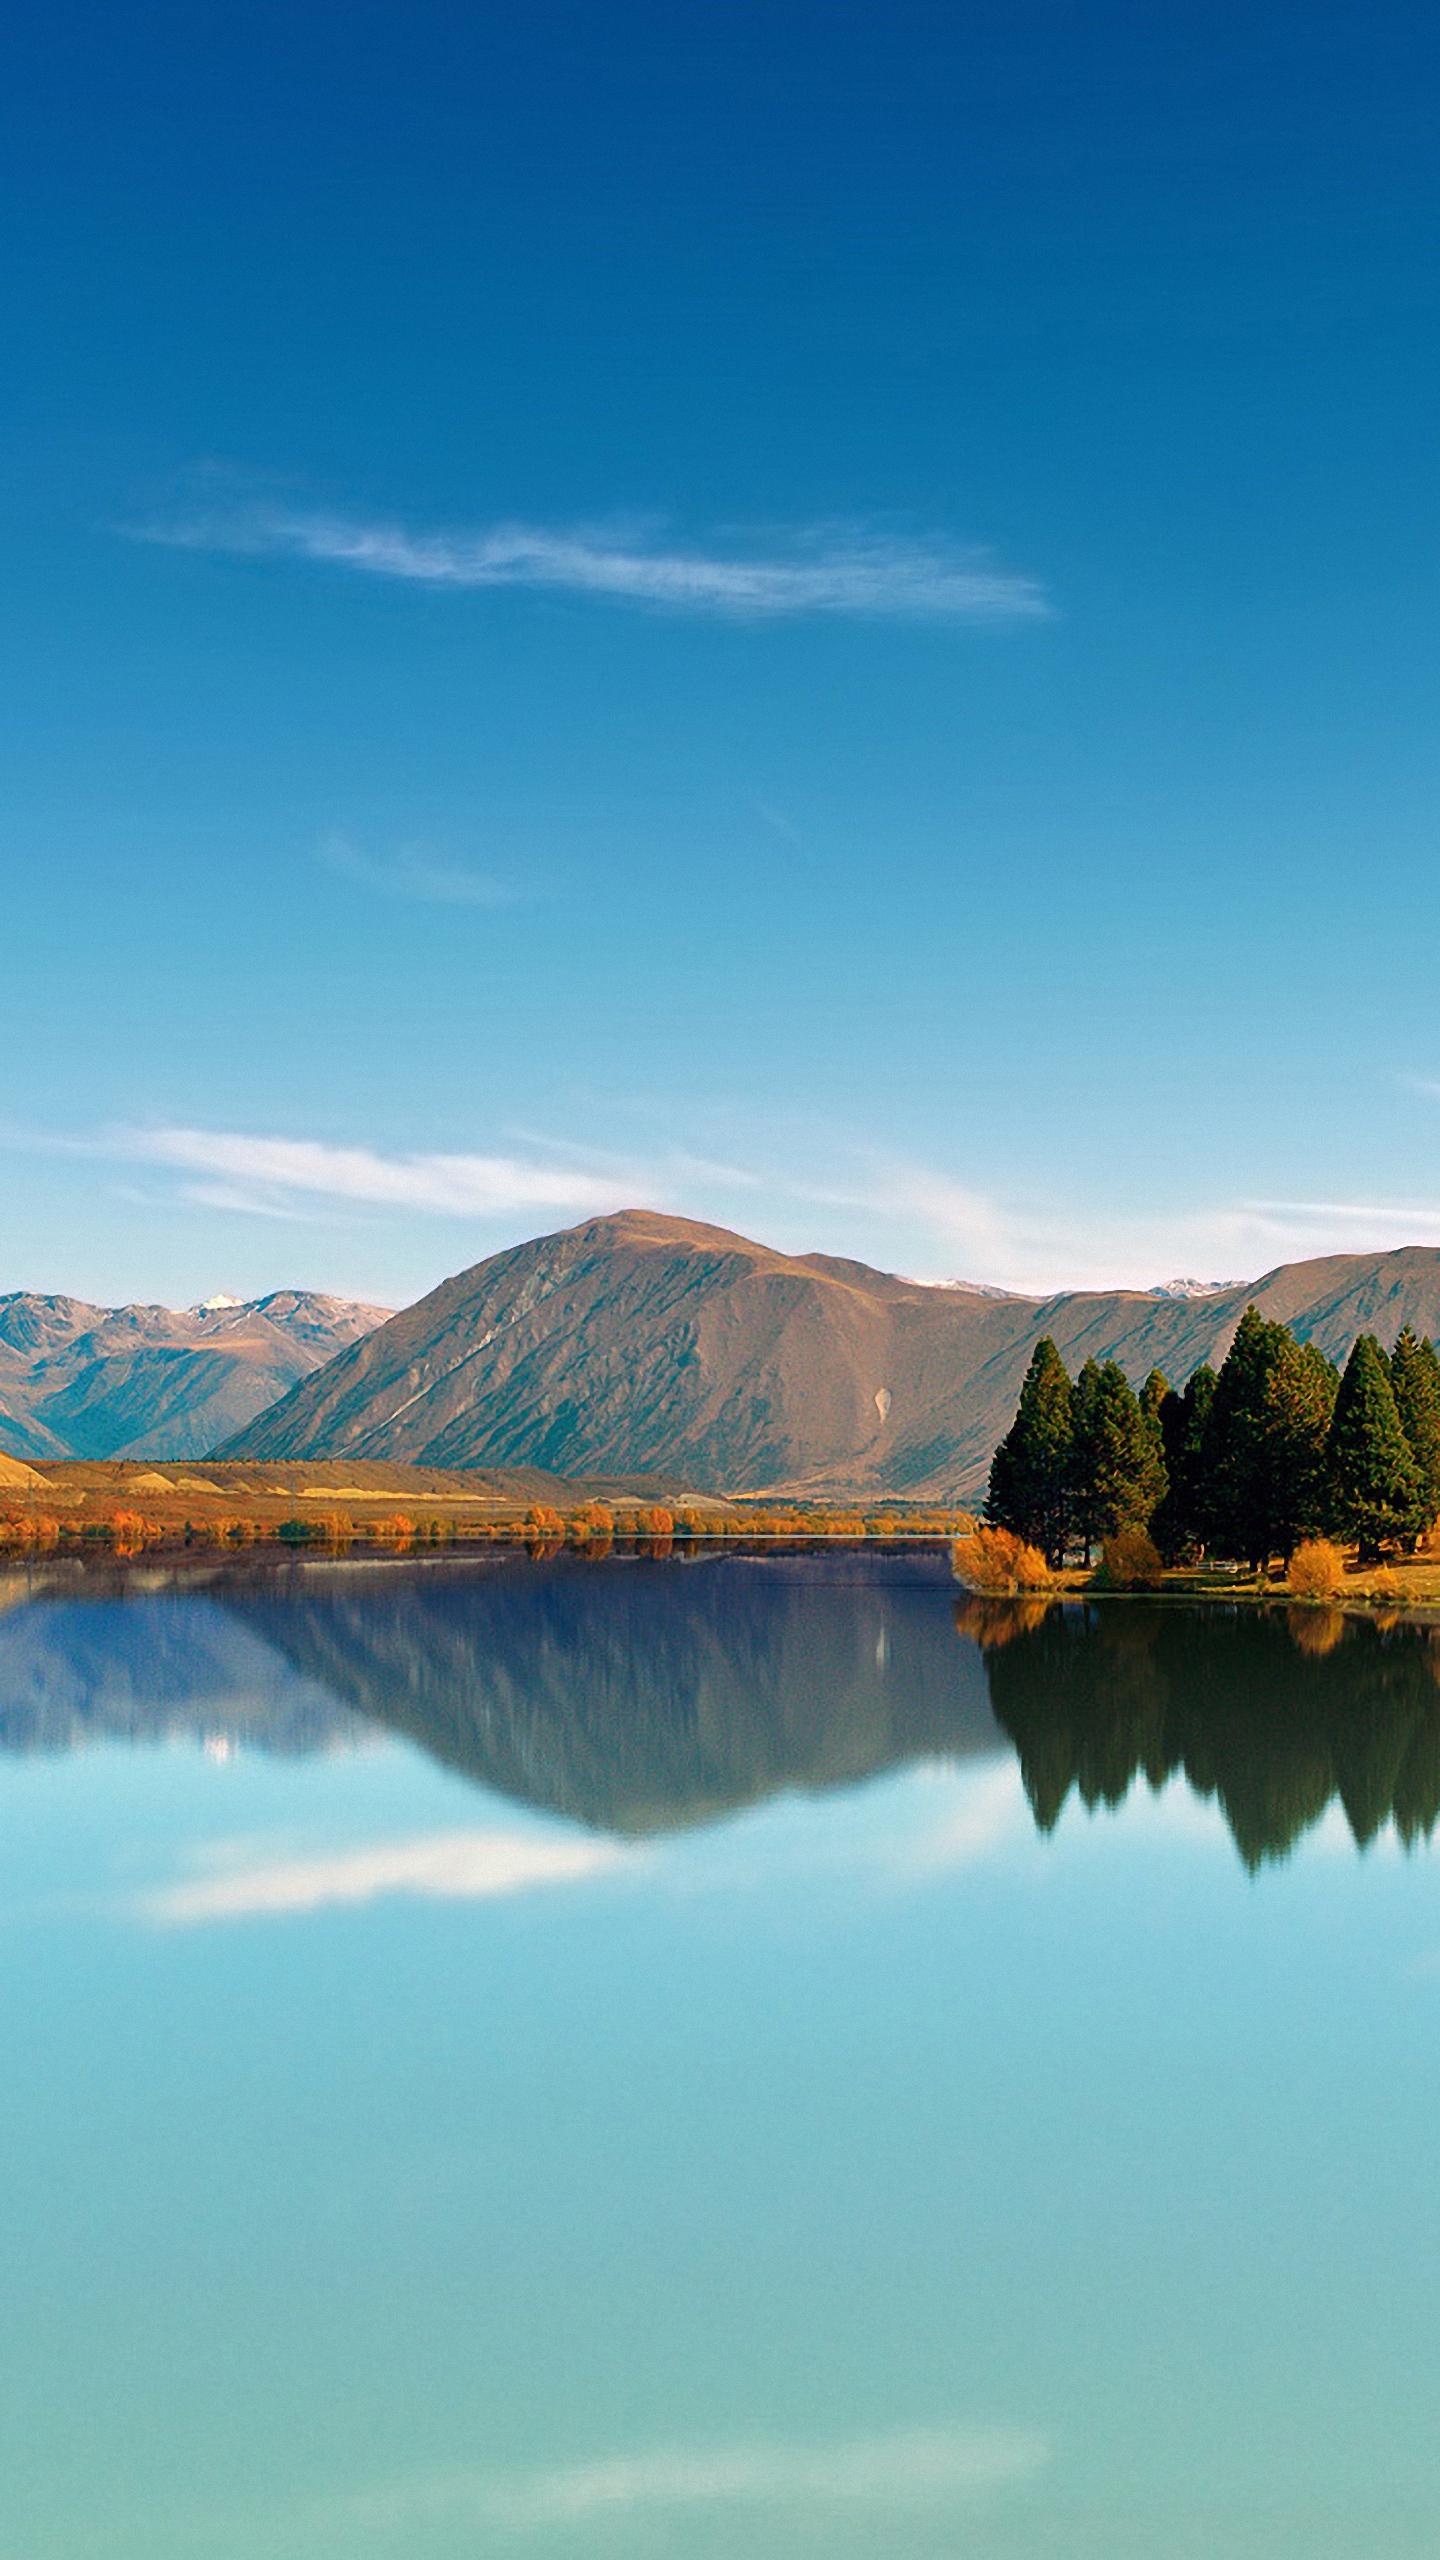 Free Download Hd 1440x2560 Nature Landscape Samsung Galaxy